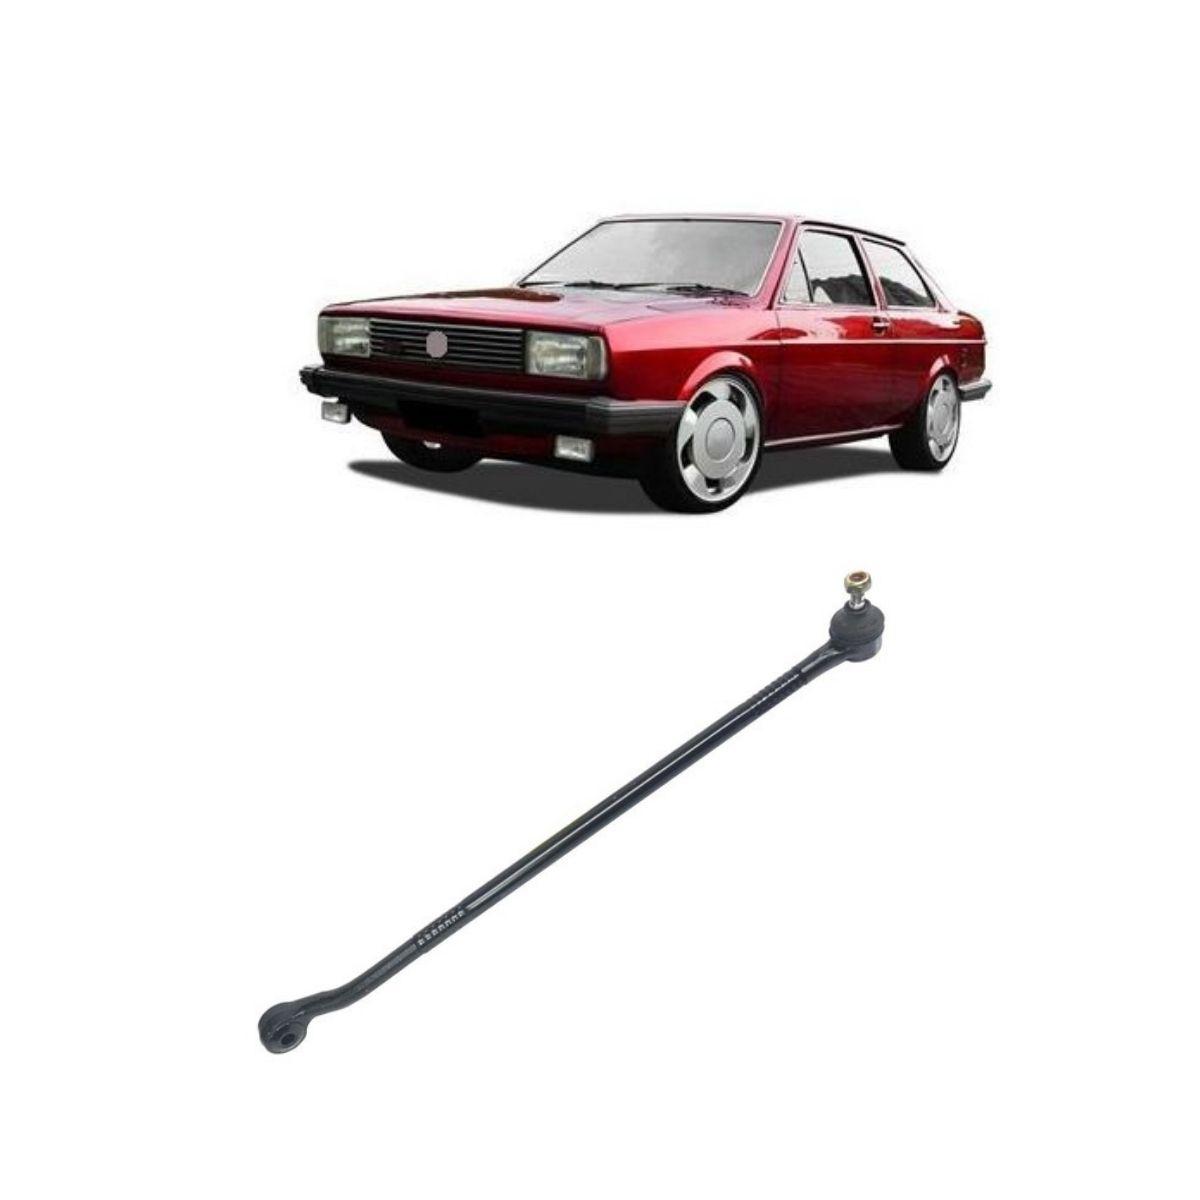 Barra De Direção Lado Direito Volkswagen Gol G1 Voyage 1984/